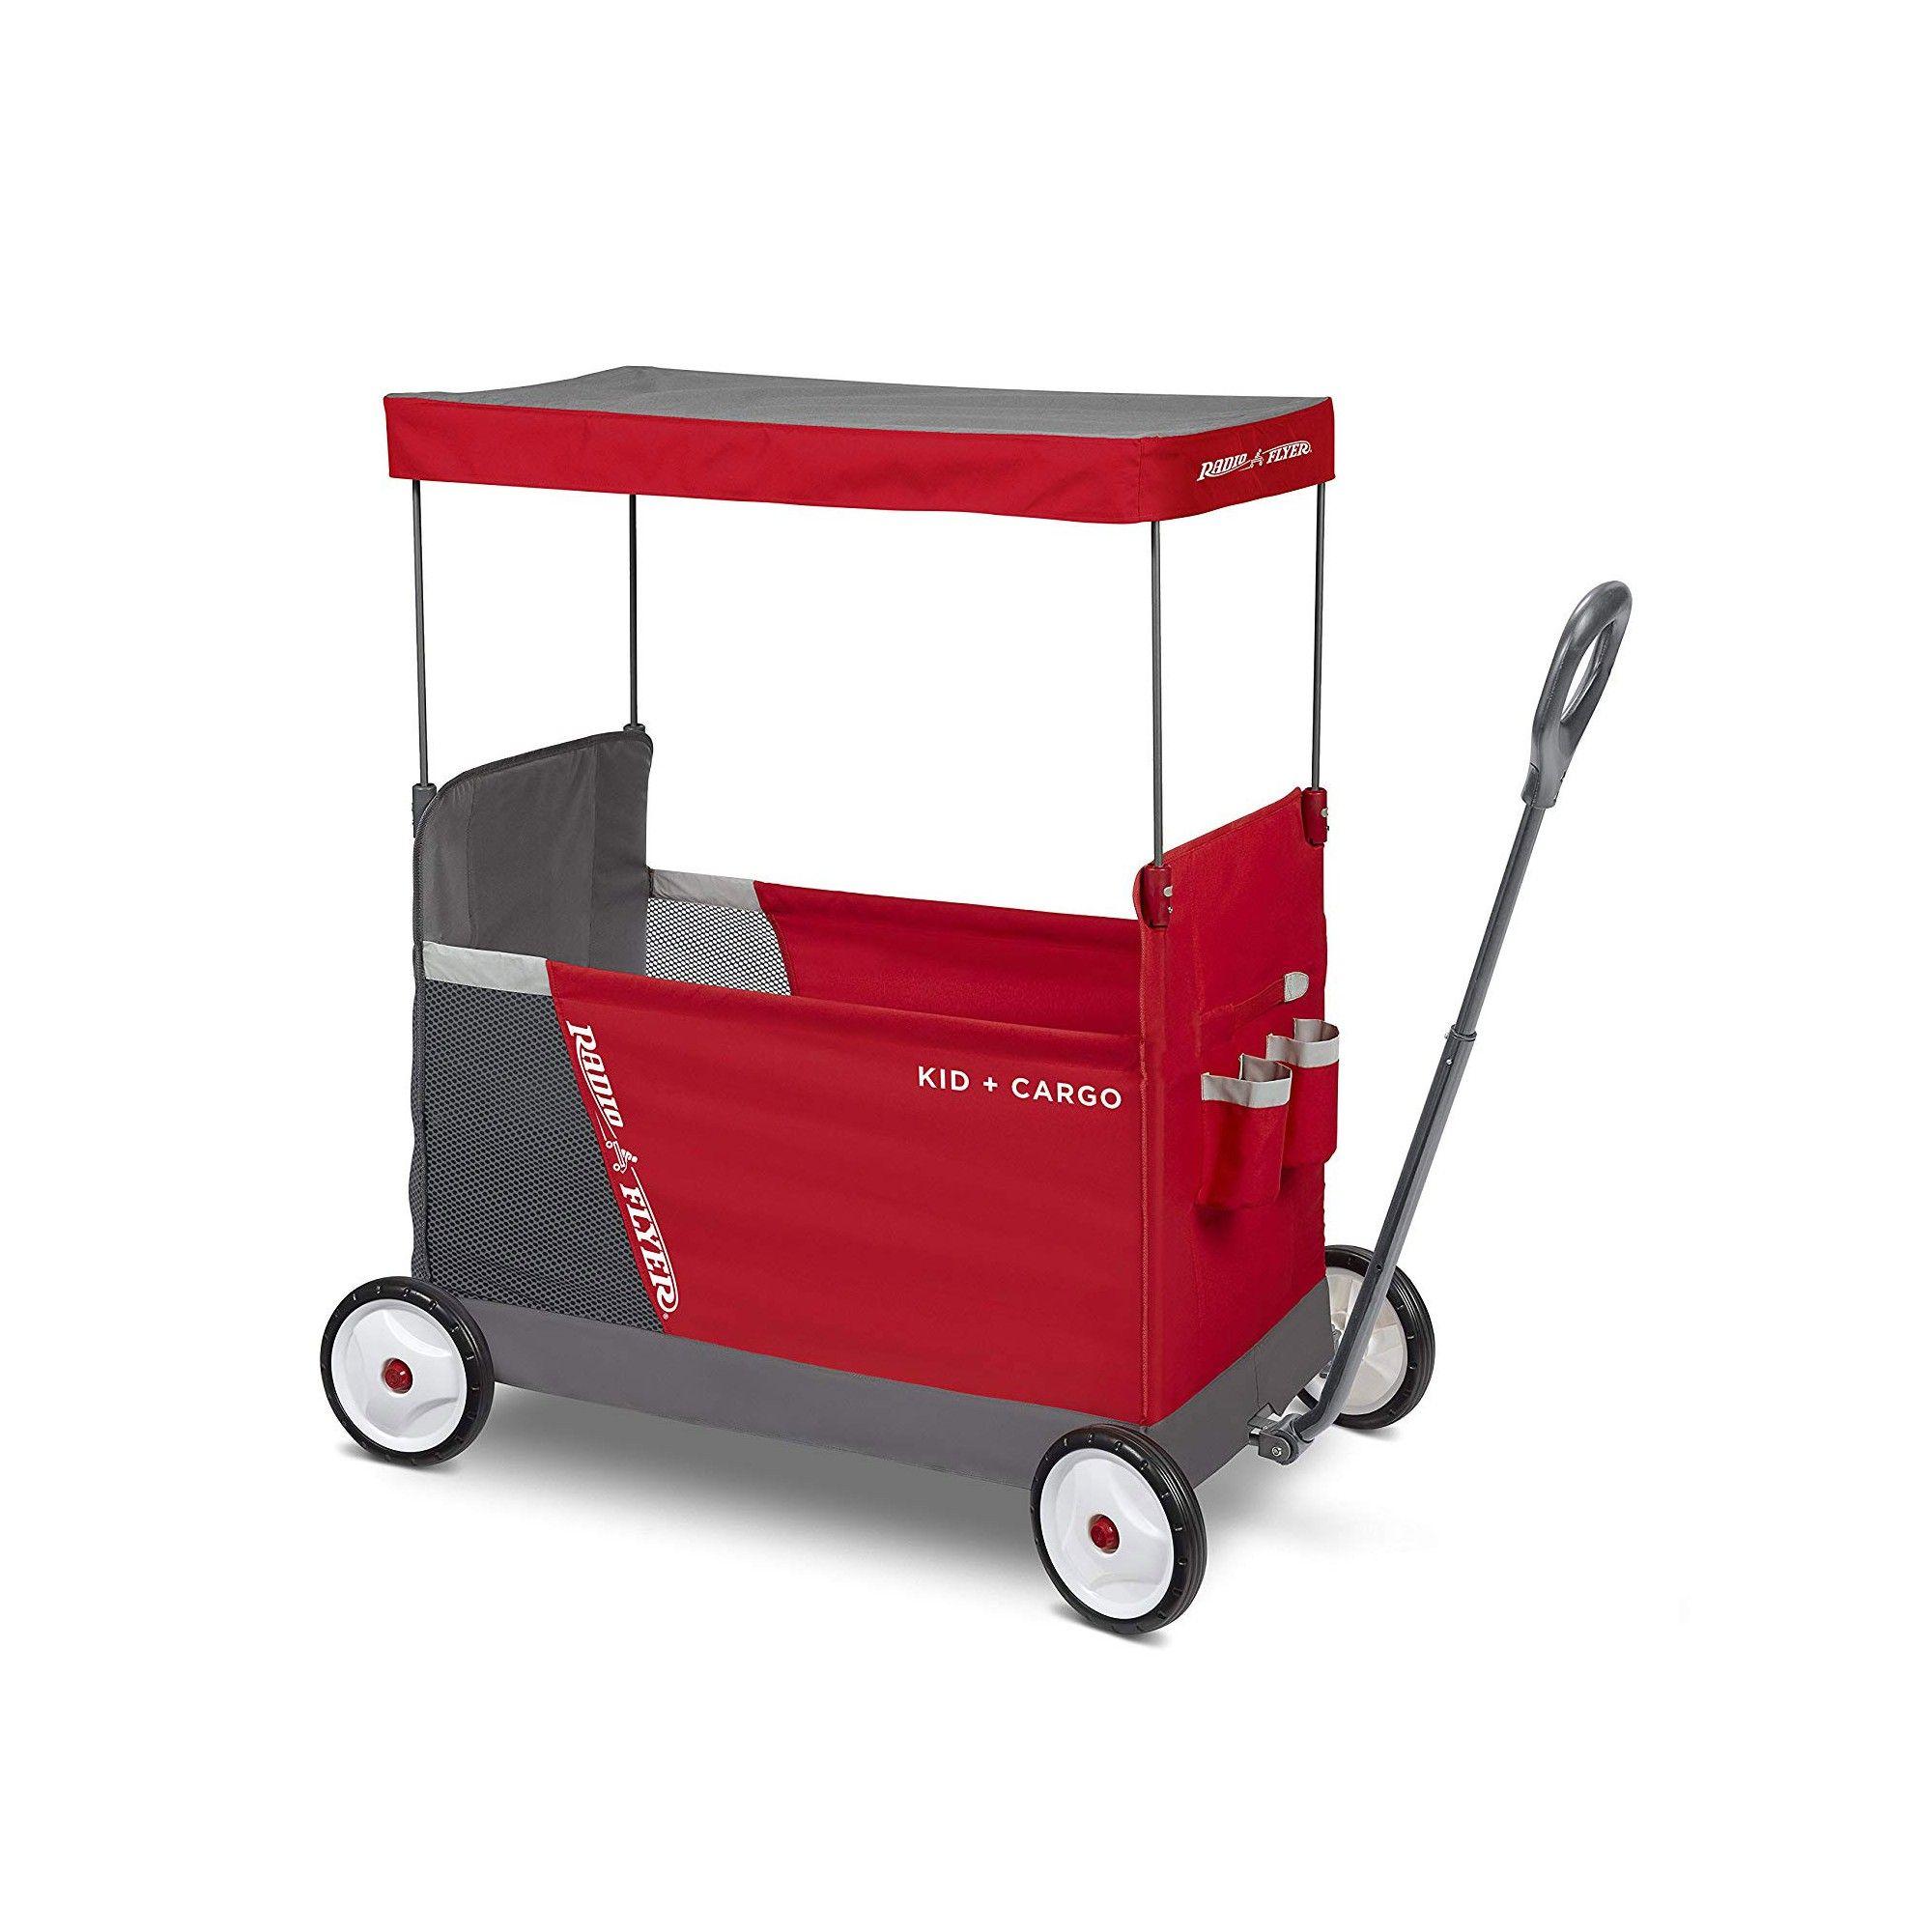 Radio Flyer Kid & Cargo Folding Wagon with 2 Versatile